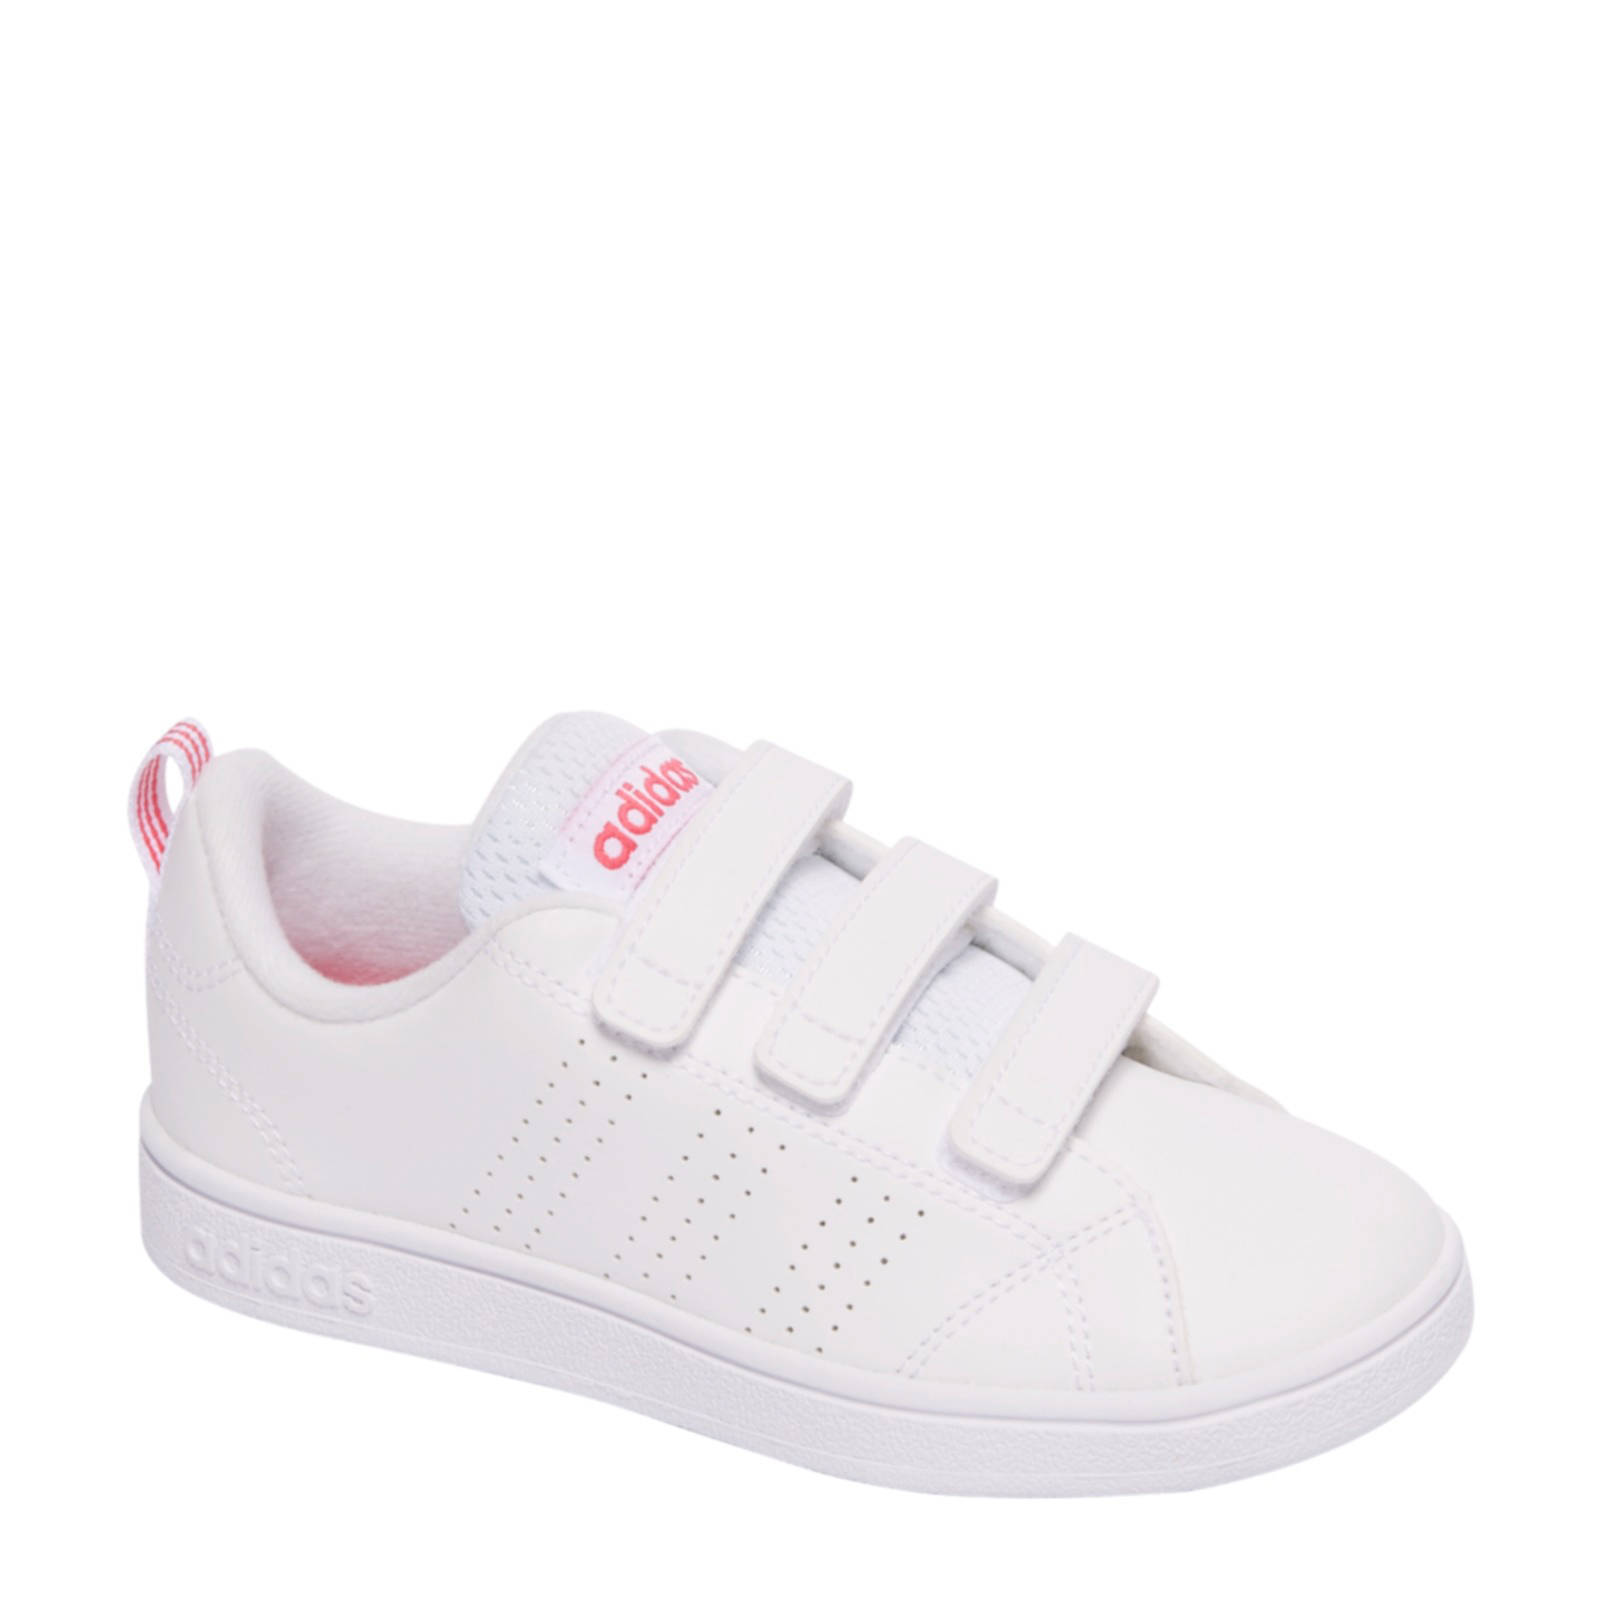 112c6d9986e4c9 ... usa vanharen adidas neo sneakers. adidas neo sneakers wit roze 33d61  392ca ...